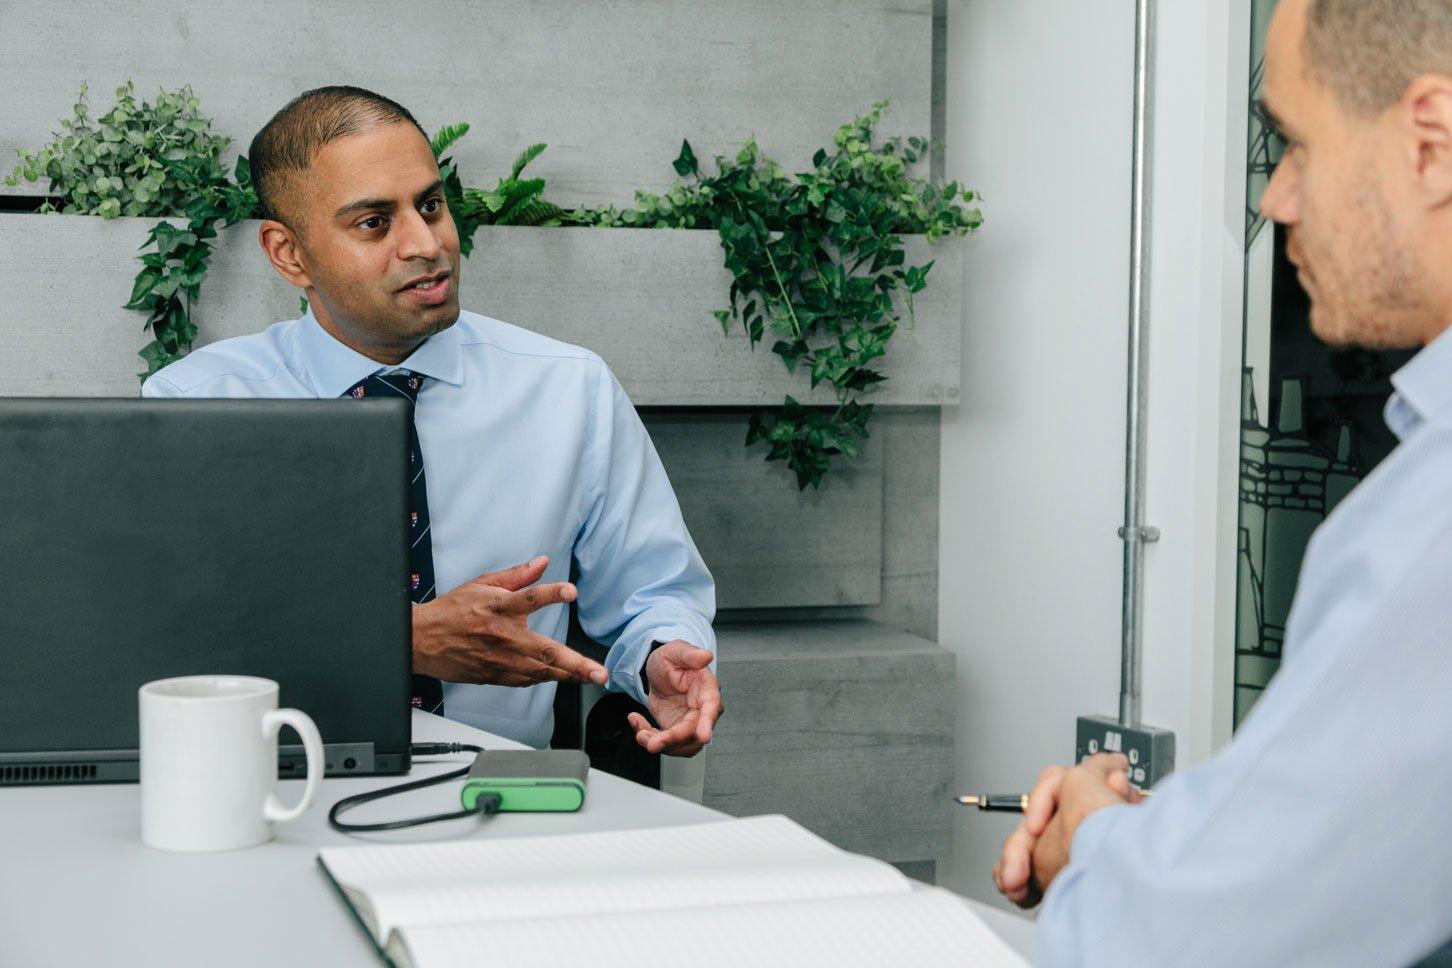 Centurion Legal Nottinghamshire - Legal Services for Employers